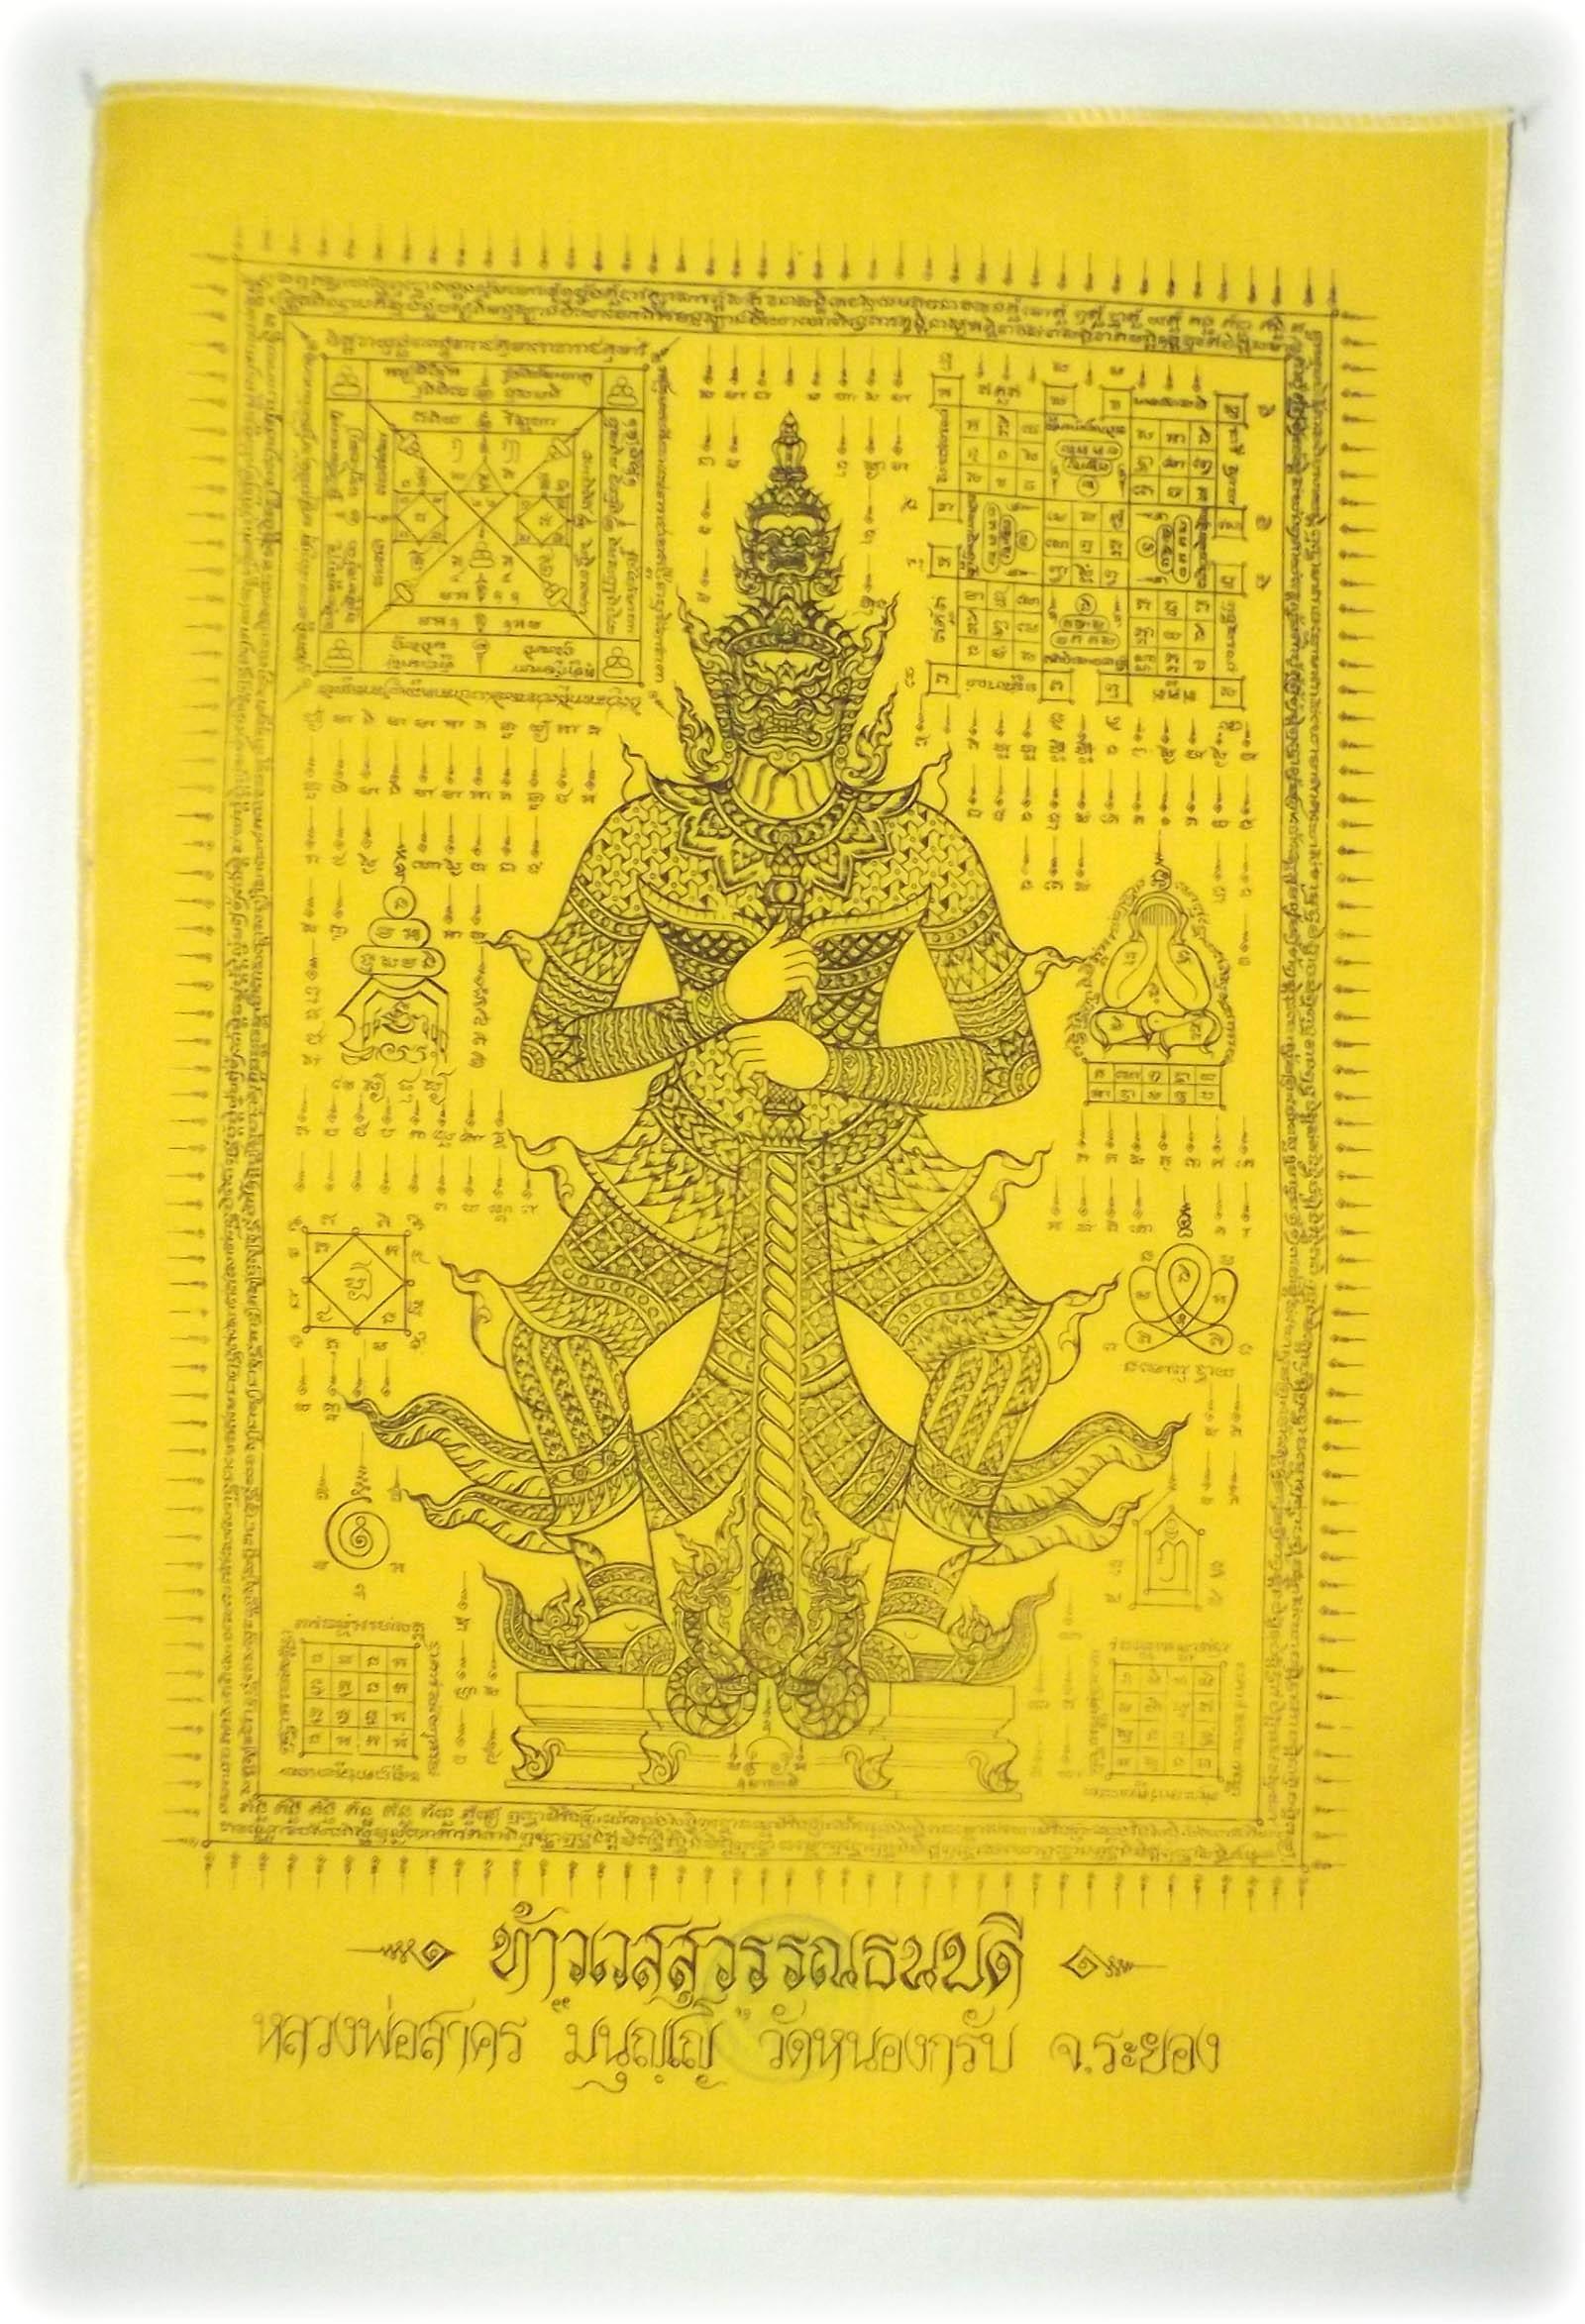 Pha Yant Taw Waes Suwan in yellow cloth by Luang Por Sakorn